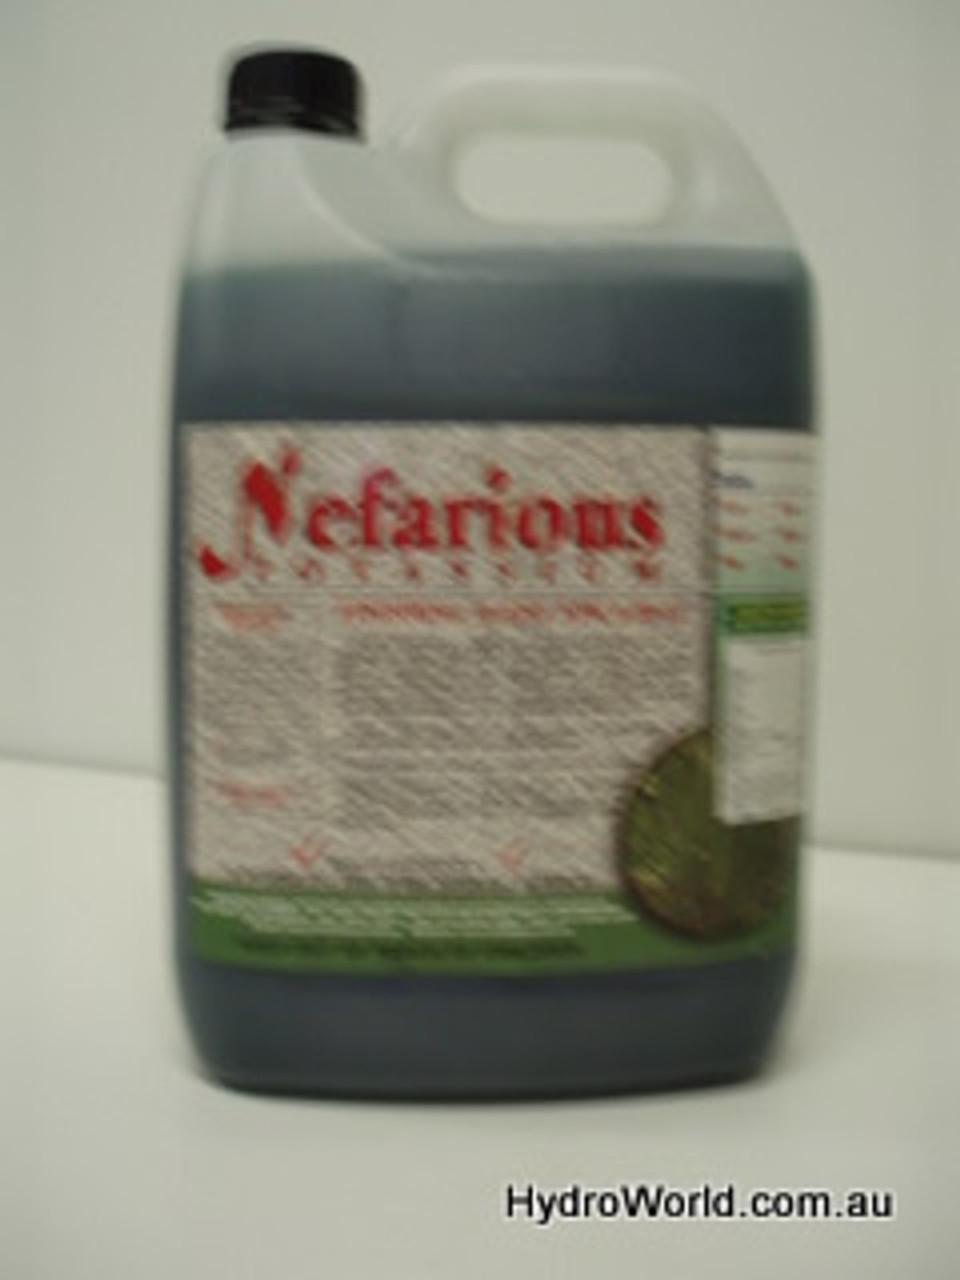 Nefarious Potash 5L